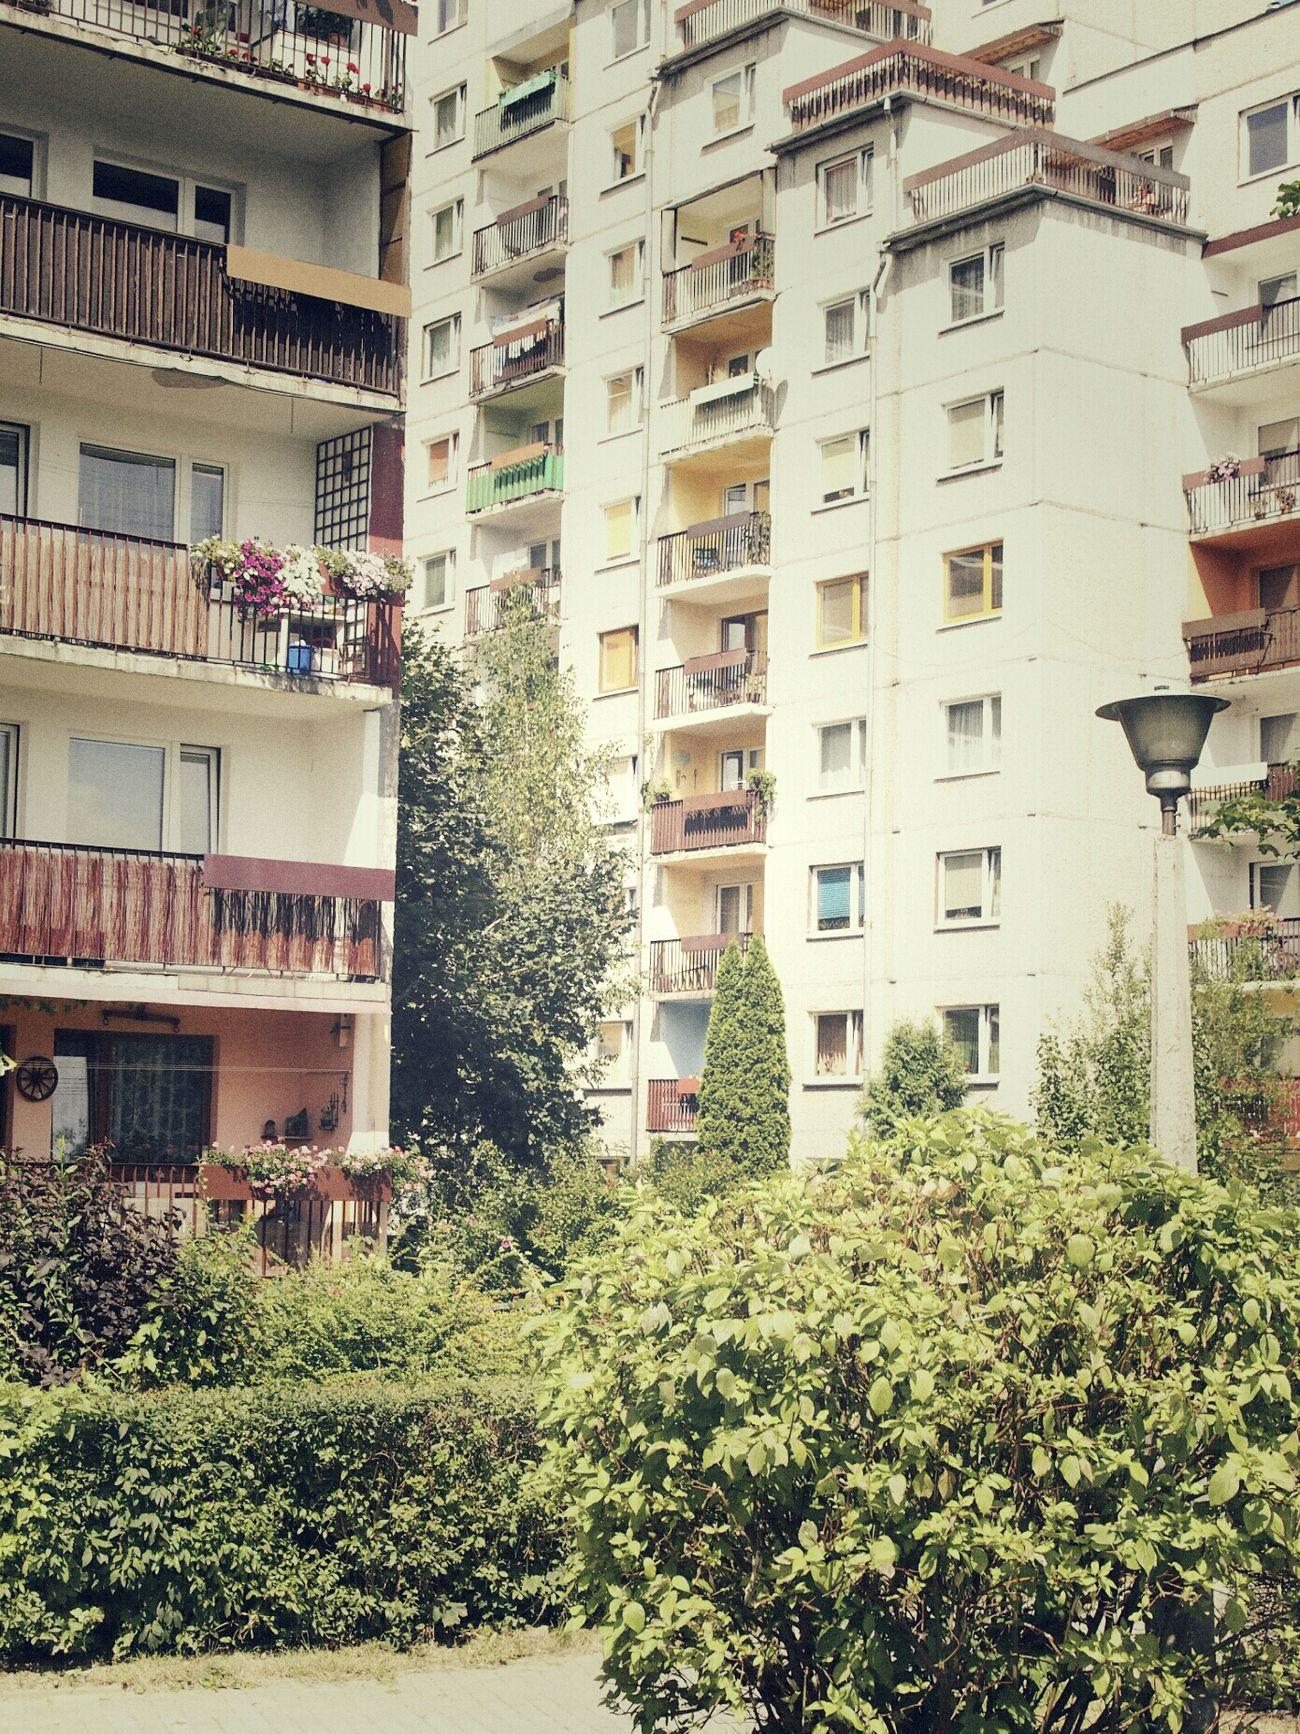 summer's almost gone 3. bielsko-biała, poland. september 2o13. EyeEm Best Shots Simplicity Streetphotography Eye4photography